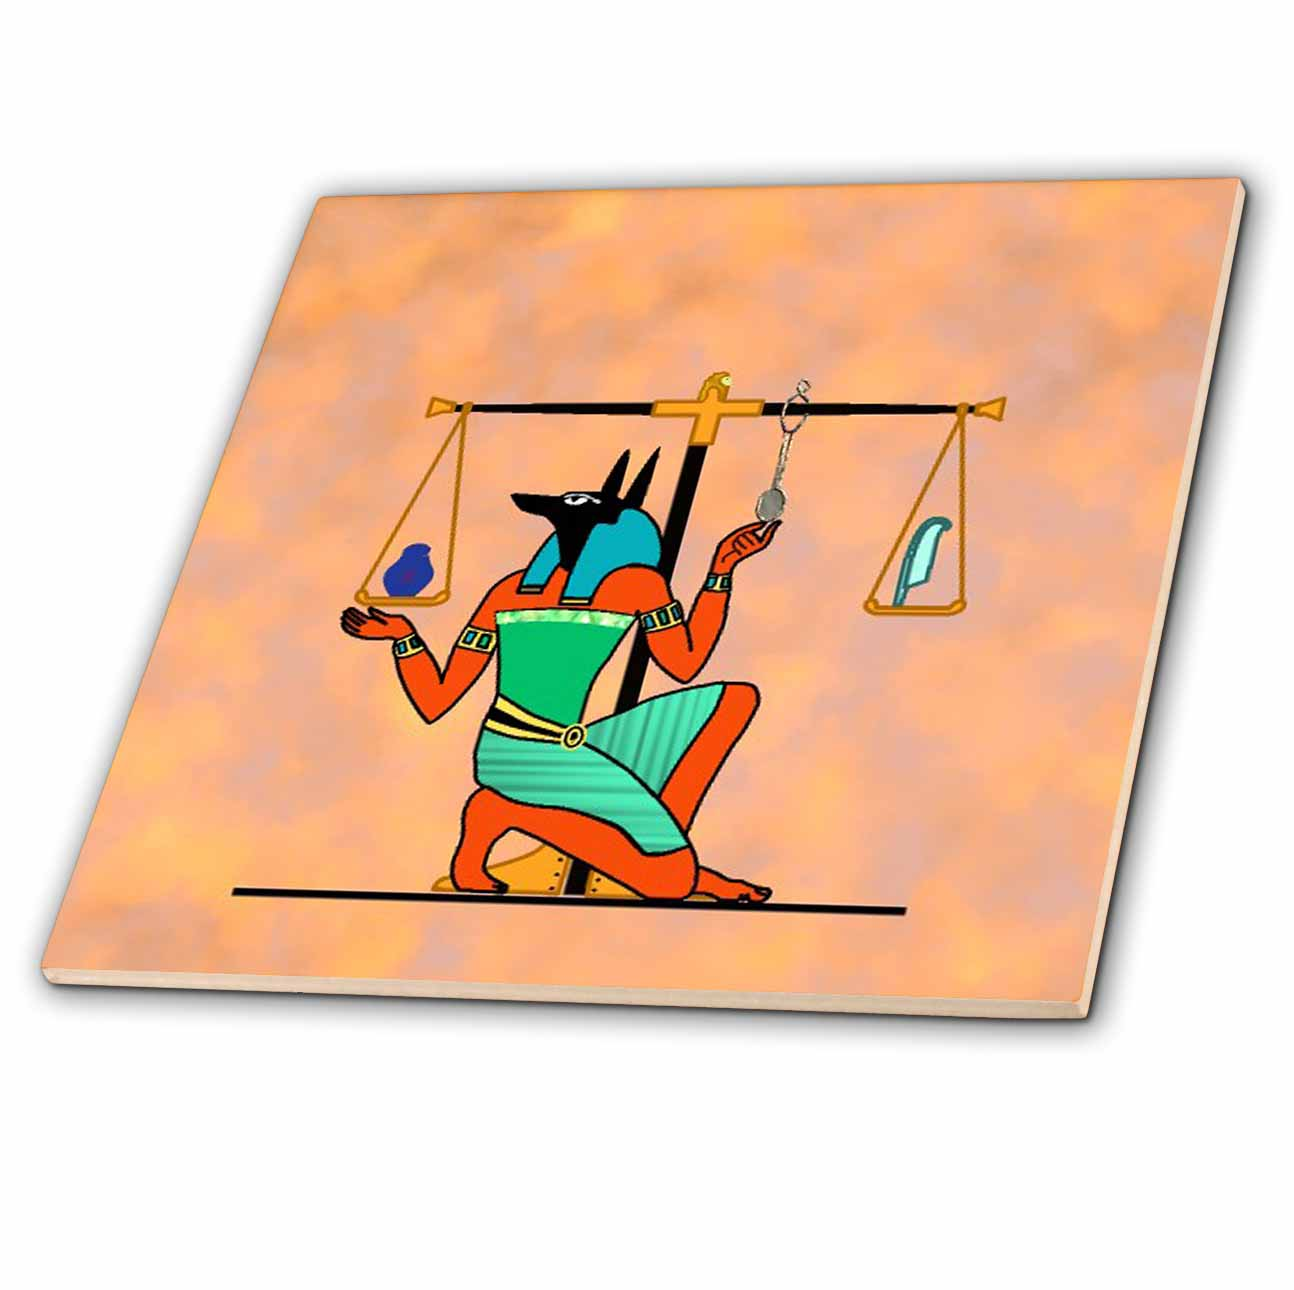 3dRose - Spiritual Awakenings-Symbols - Egyptian painting and scales - Tiles at Sears.com